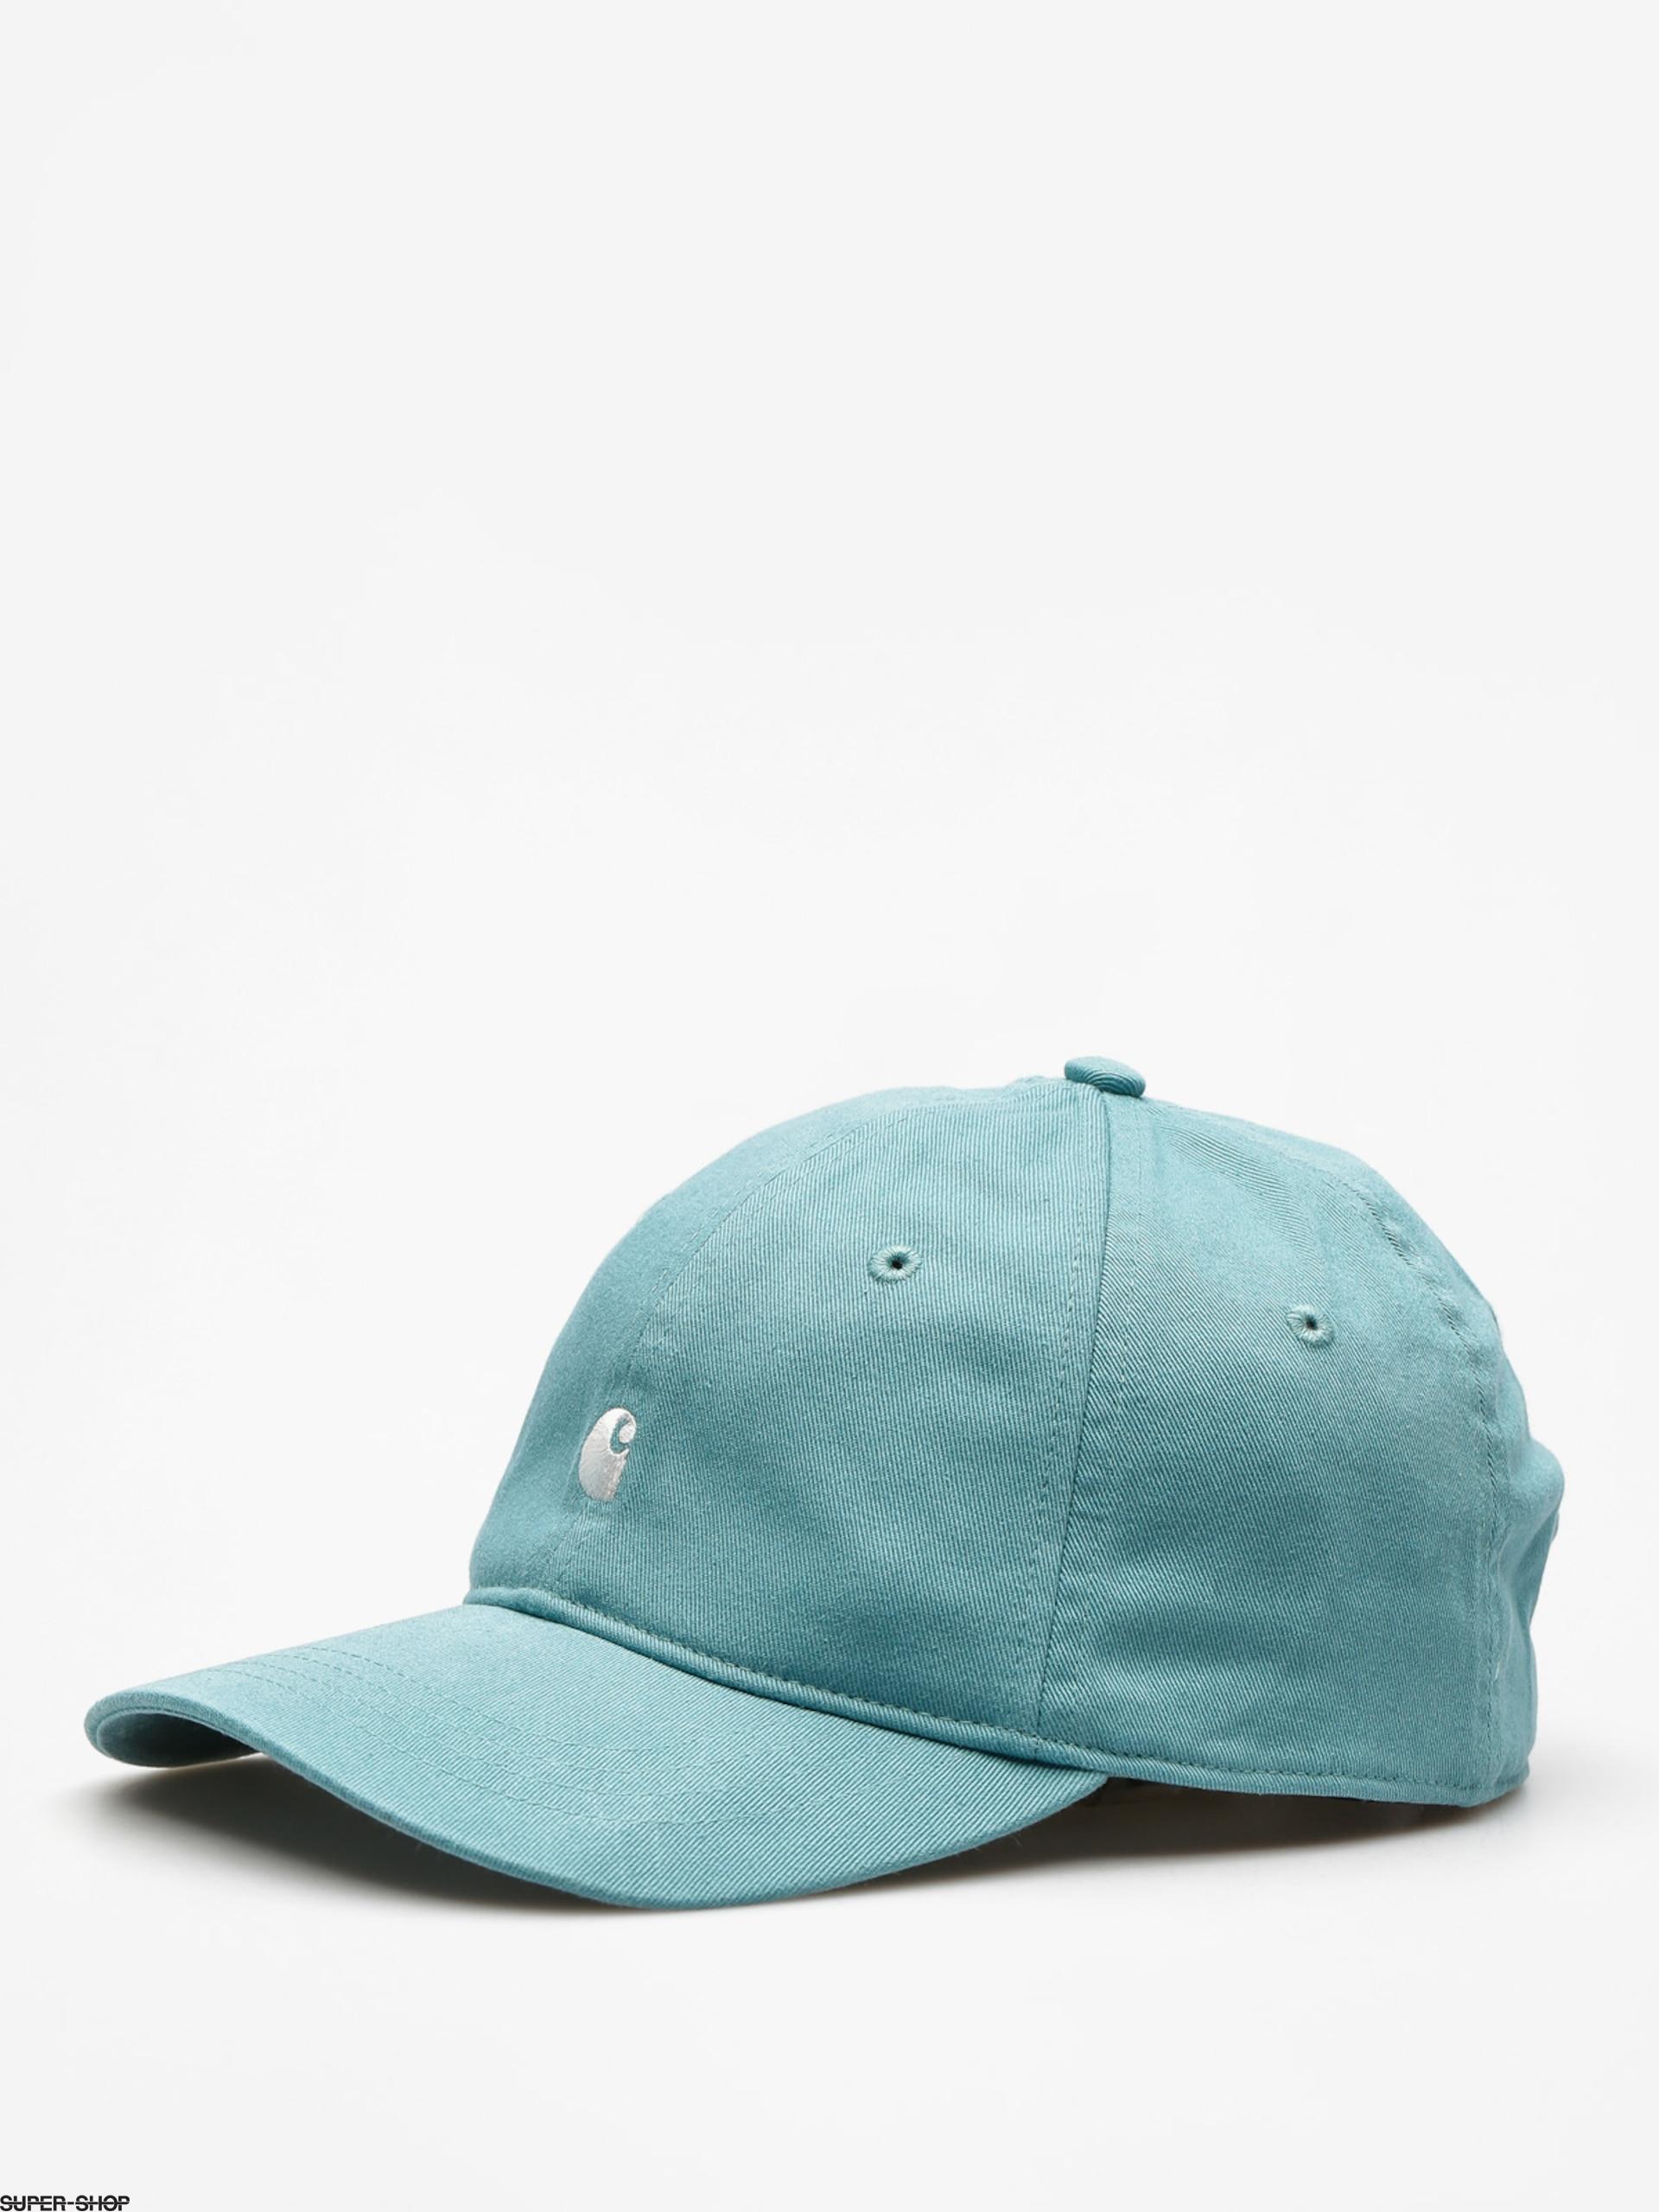 6ef3ab4ed9edf9 new zealand carhartt wip hats madison logo baseball cap navy blue from  village b04dd af0bf; czech carhartt cap madison logo zd soft teal white  446da 4653e